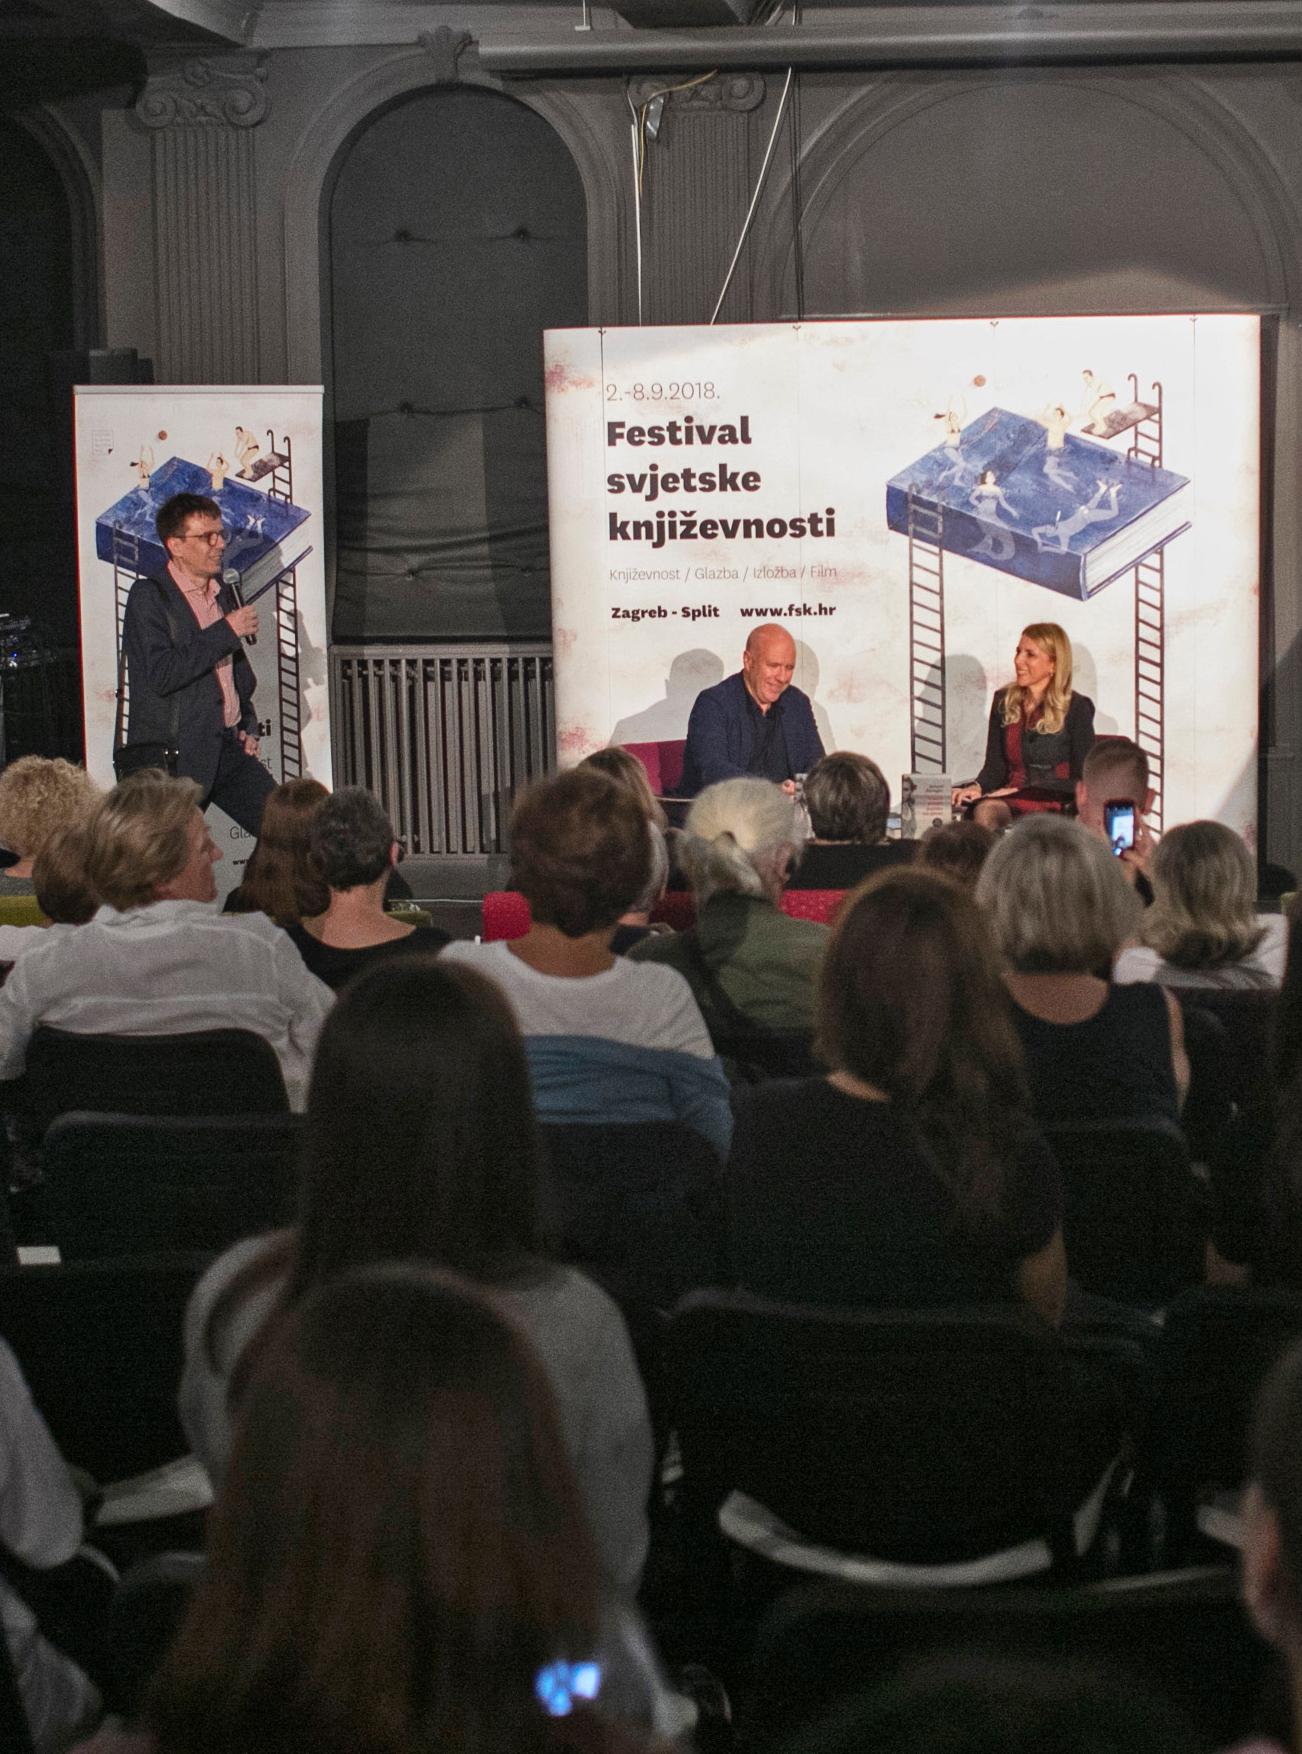 armensko kulturno druženje sci fi speed dating prijavite se